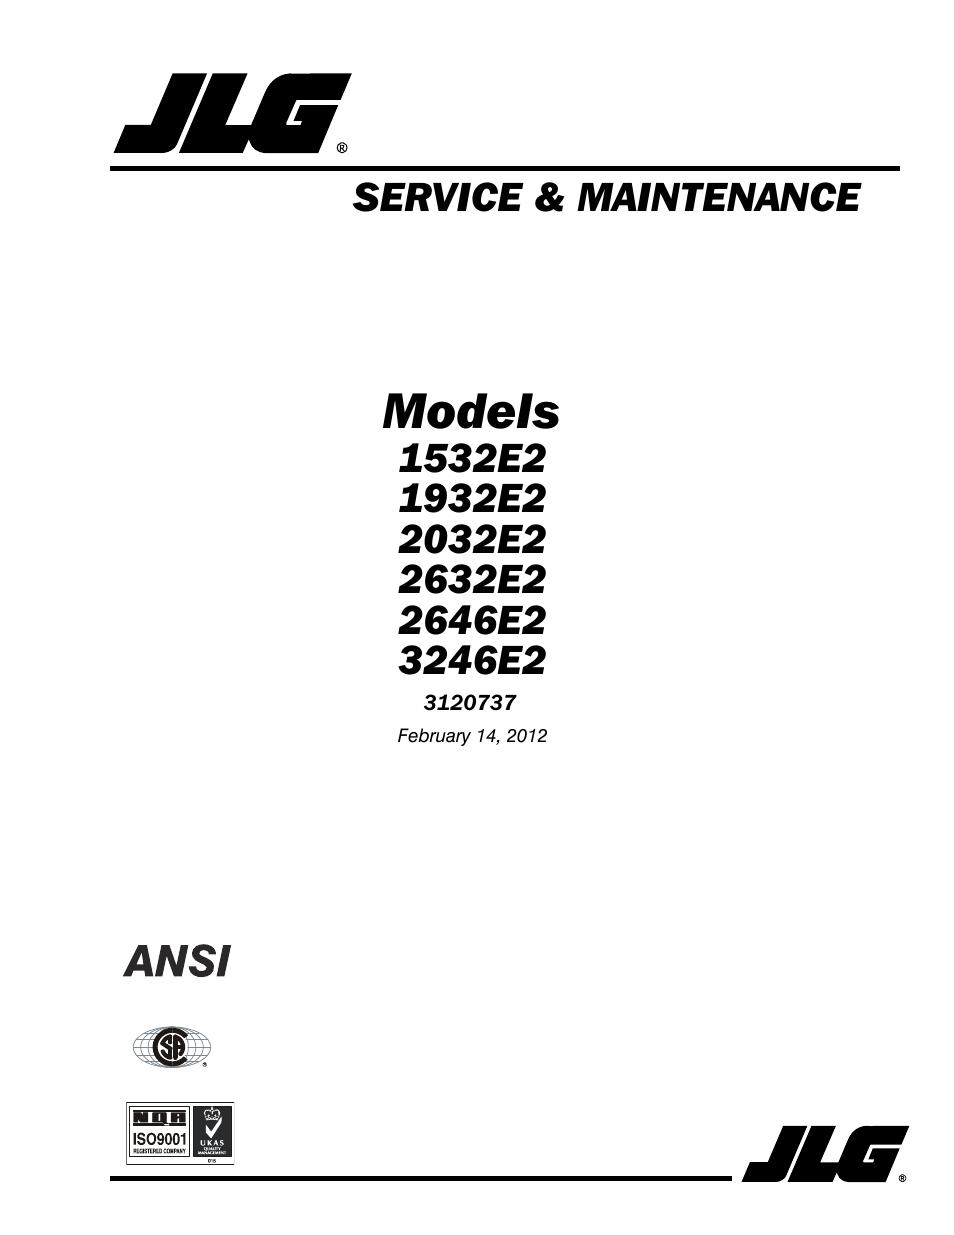 JLG 3246E2 ANSI Service Manual User Manual | 86 pages | Also for: 2646E2  ANSI Service Manual, 2632E2 ANSI Service Manual, 2032E2 ANSI Service Manual,  ...